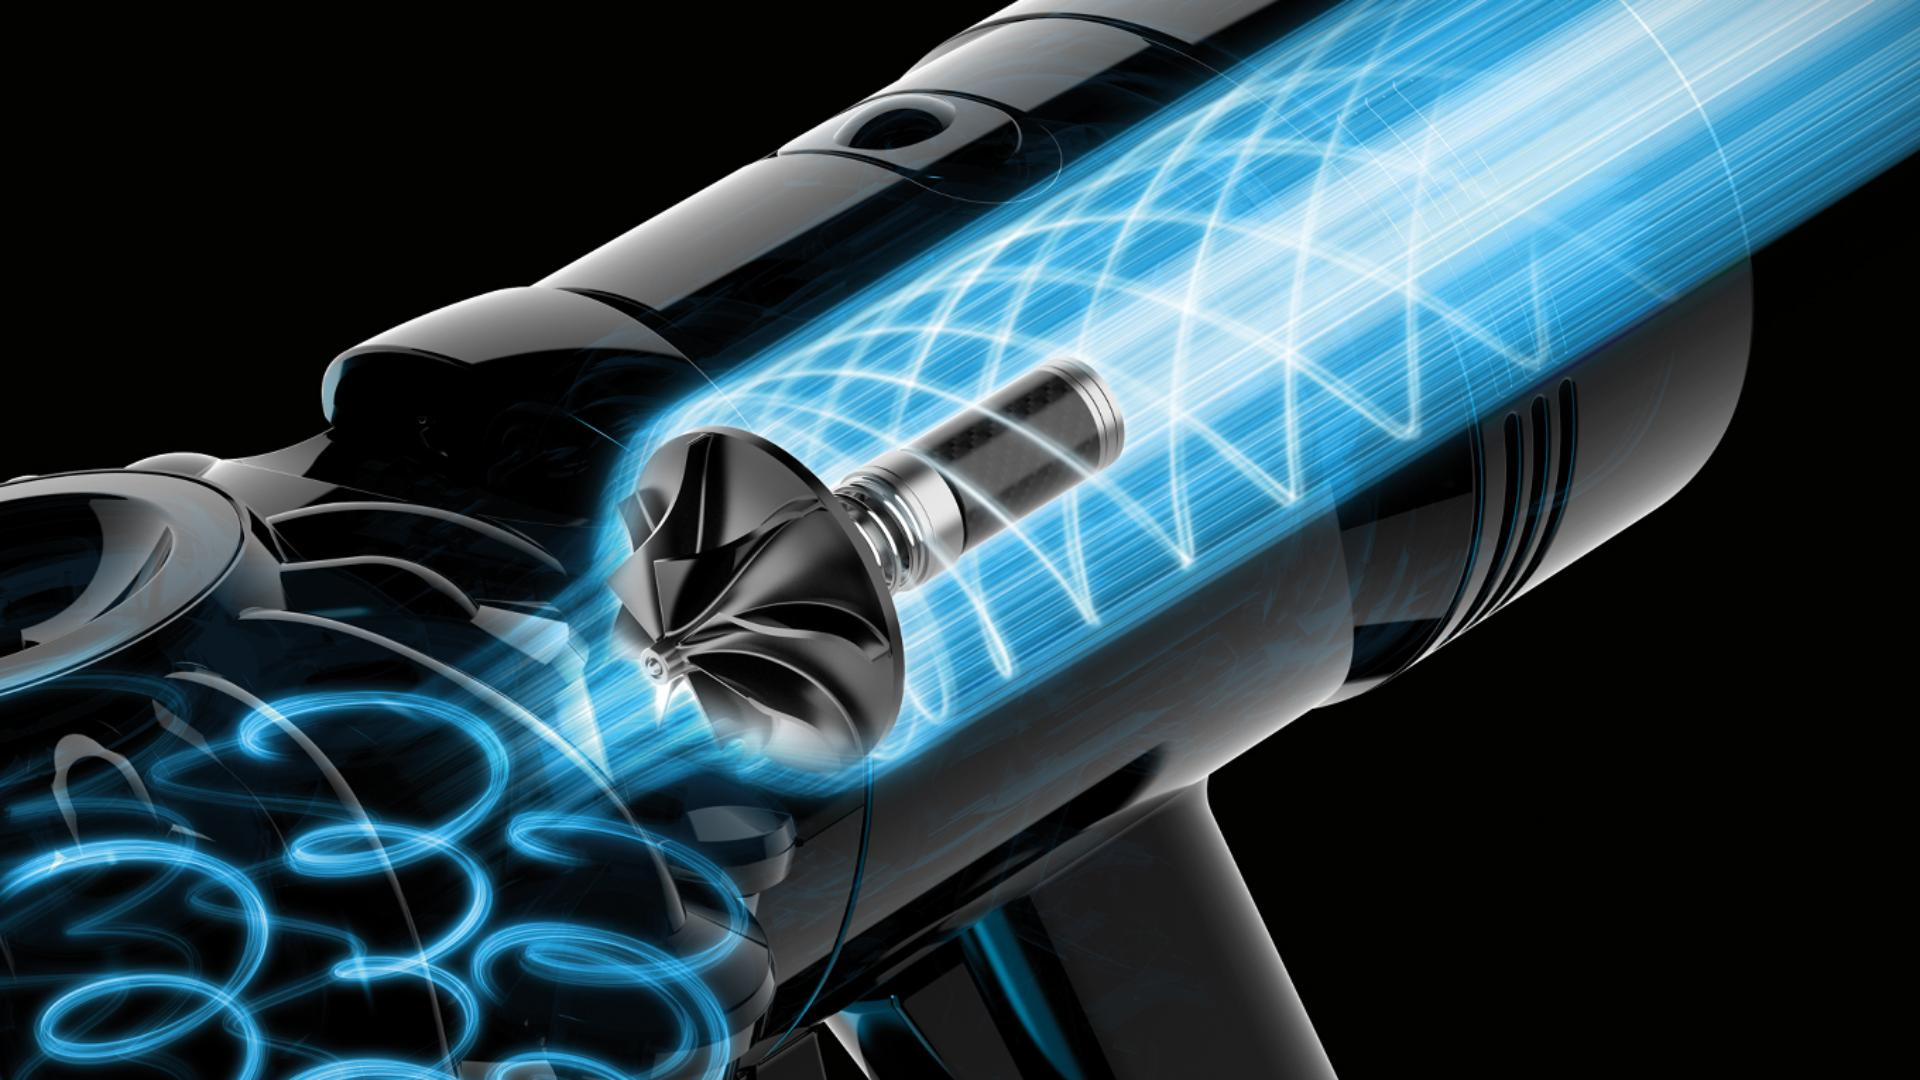 Dyson's V8 digital motor